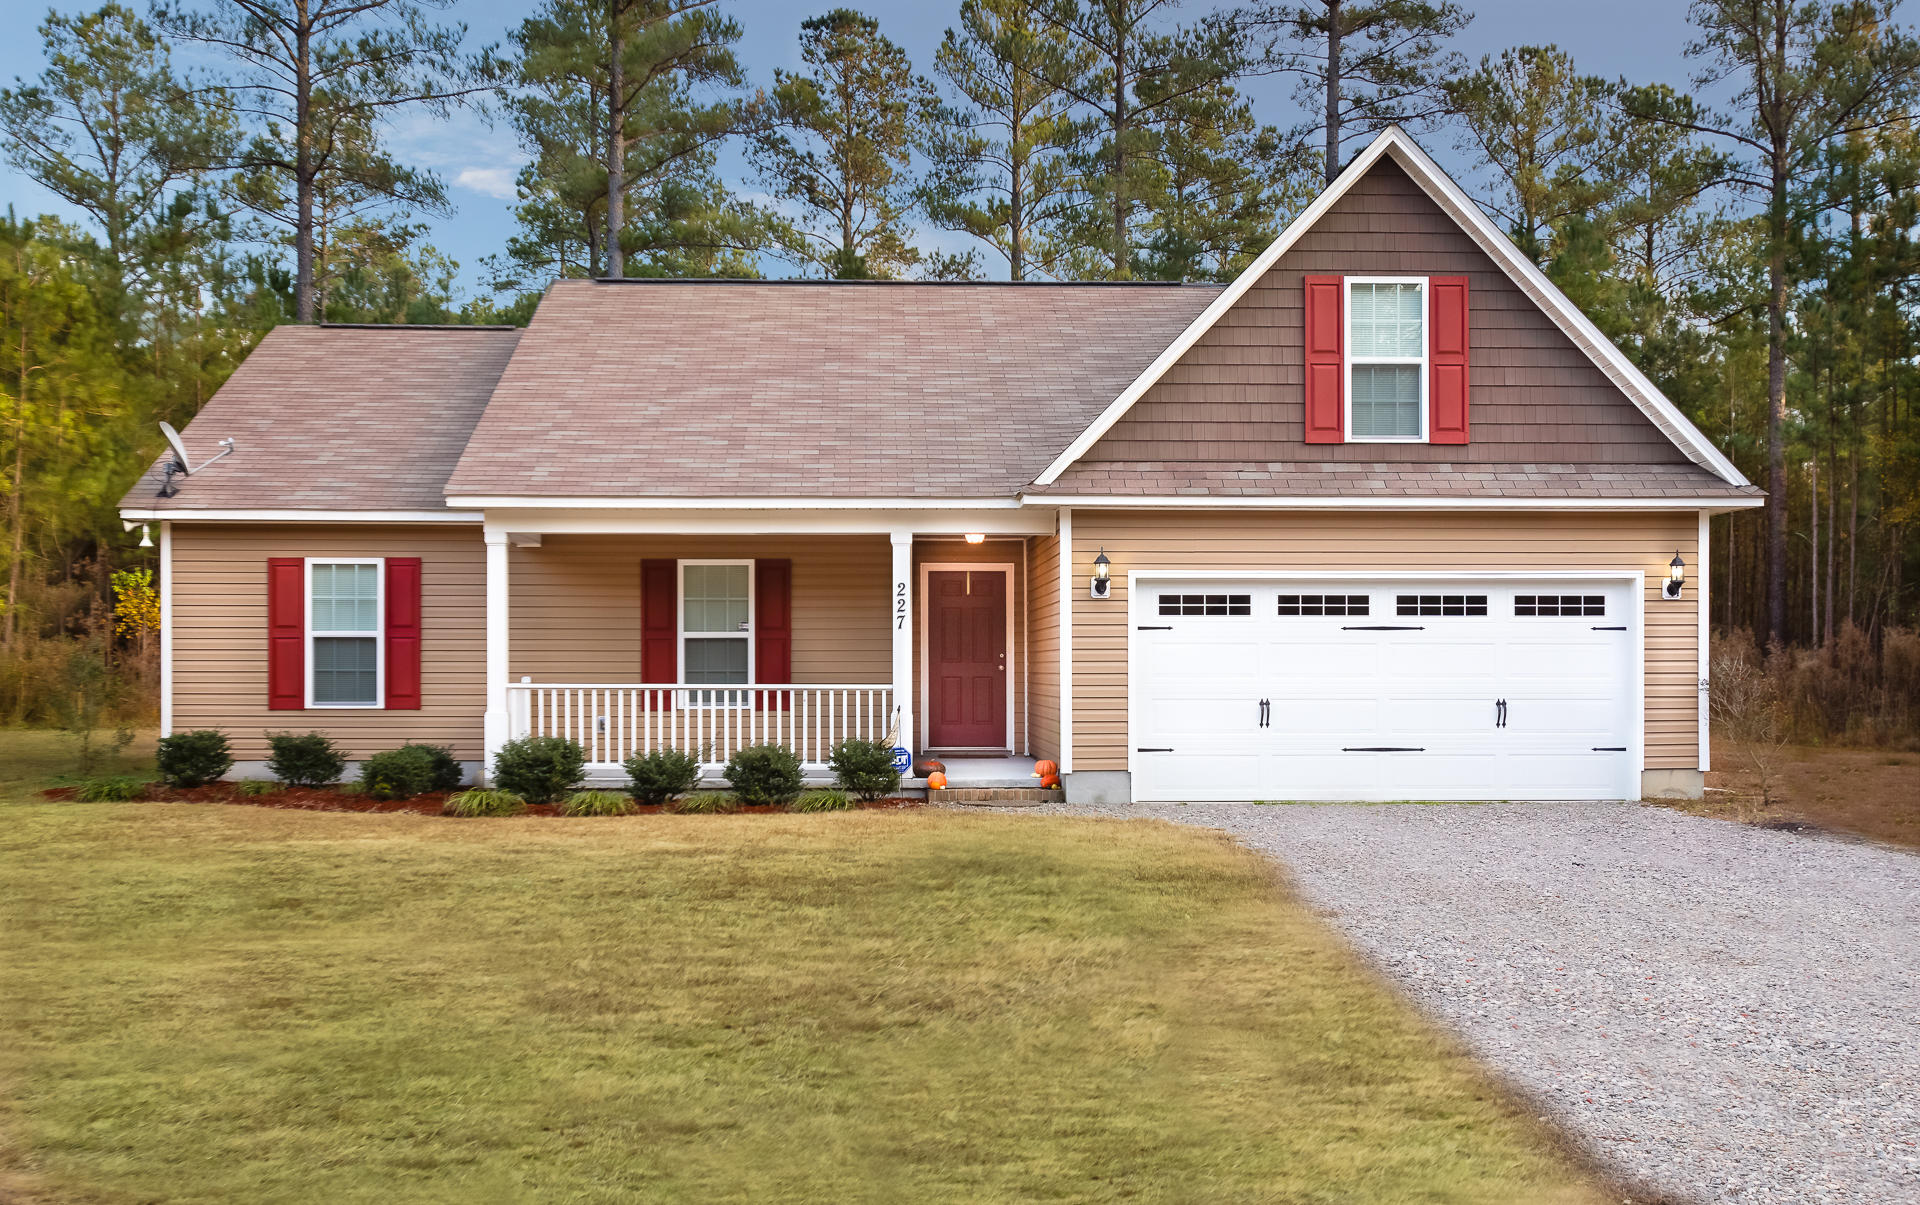 227  Dewey Drive, Aberdeen in Hoke County, NC 28315 Home for Sale